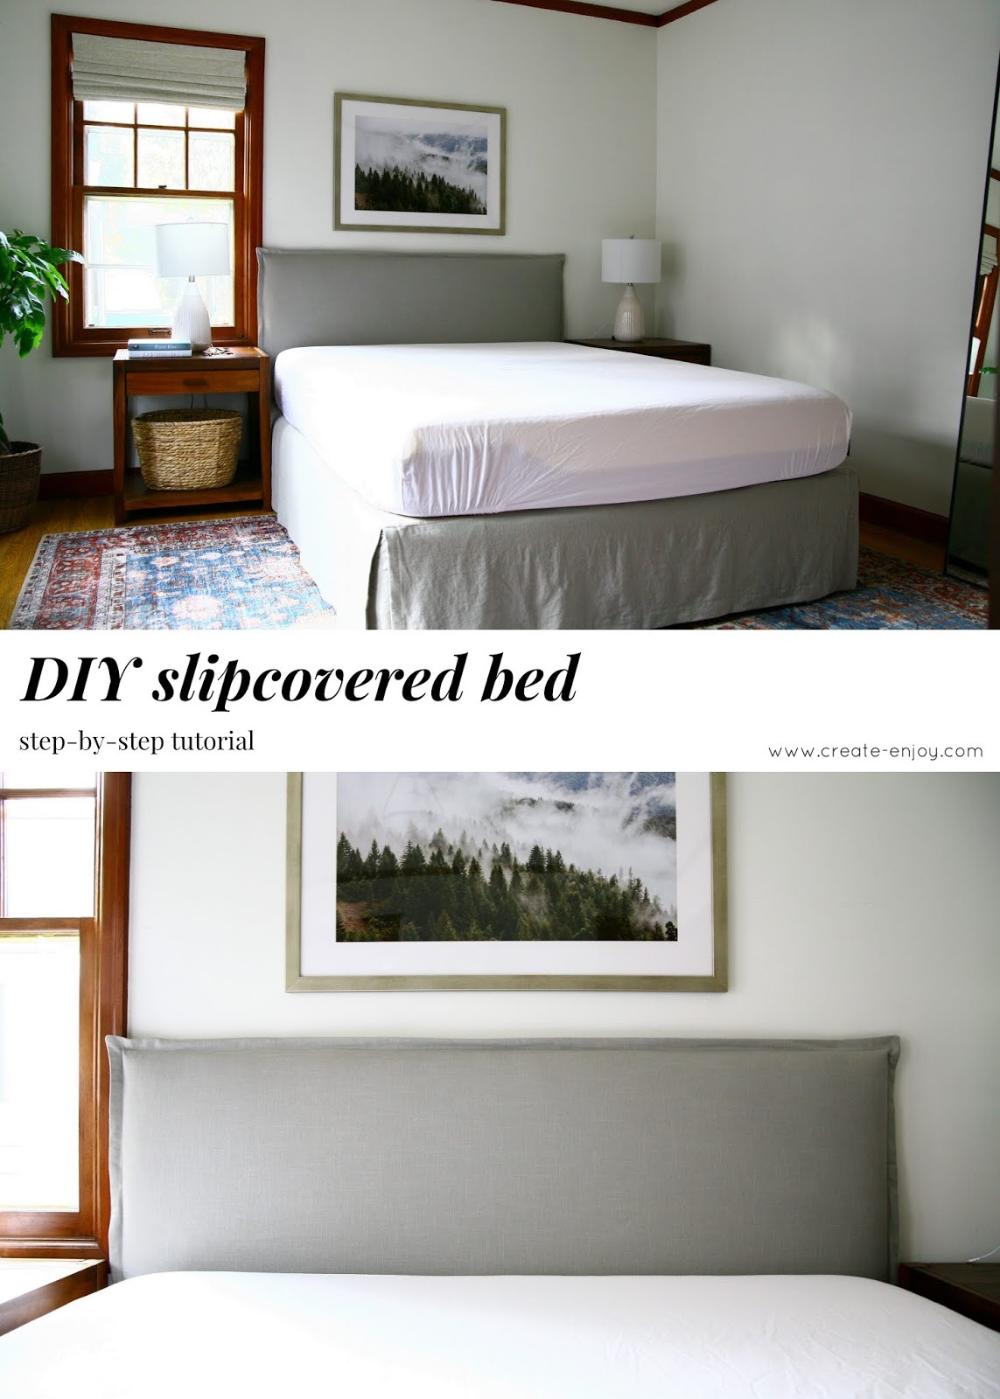 DIY upholstered & slipcovered bed tutorial | Diy apartment ...